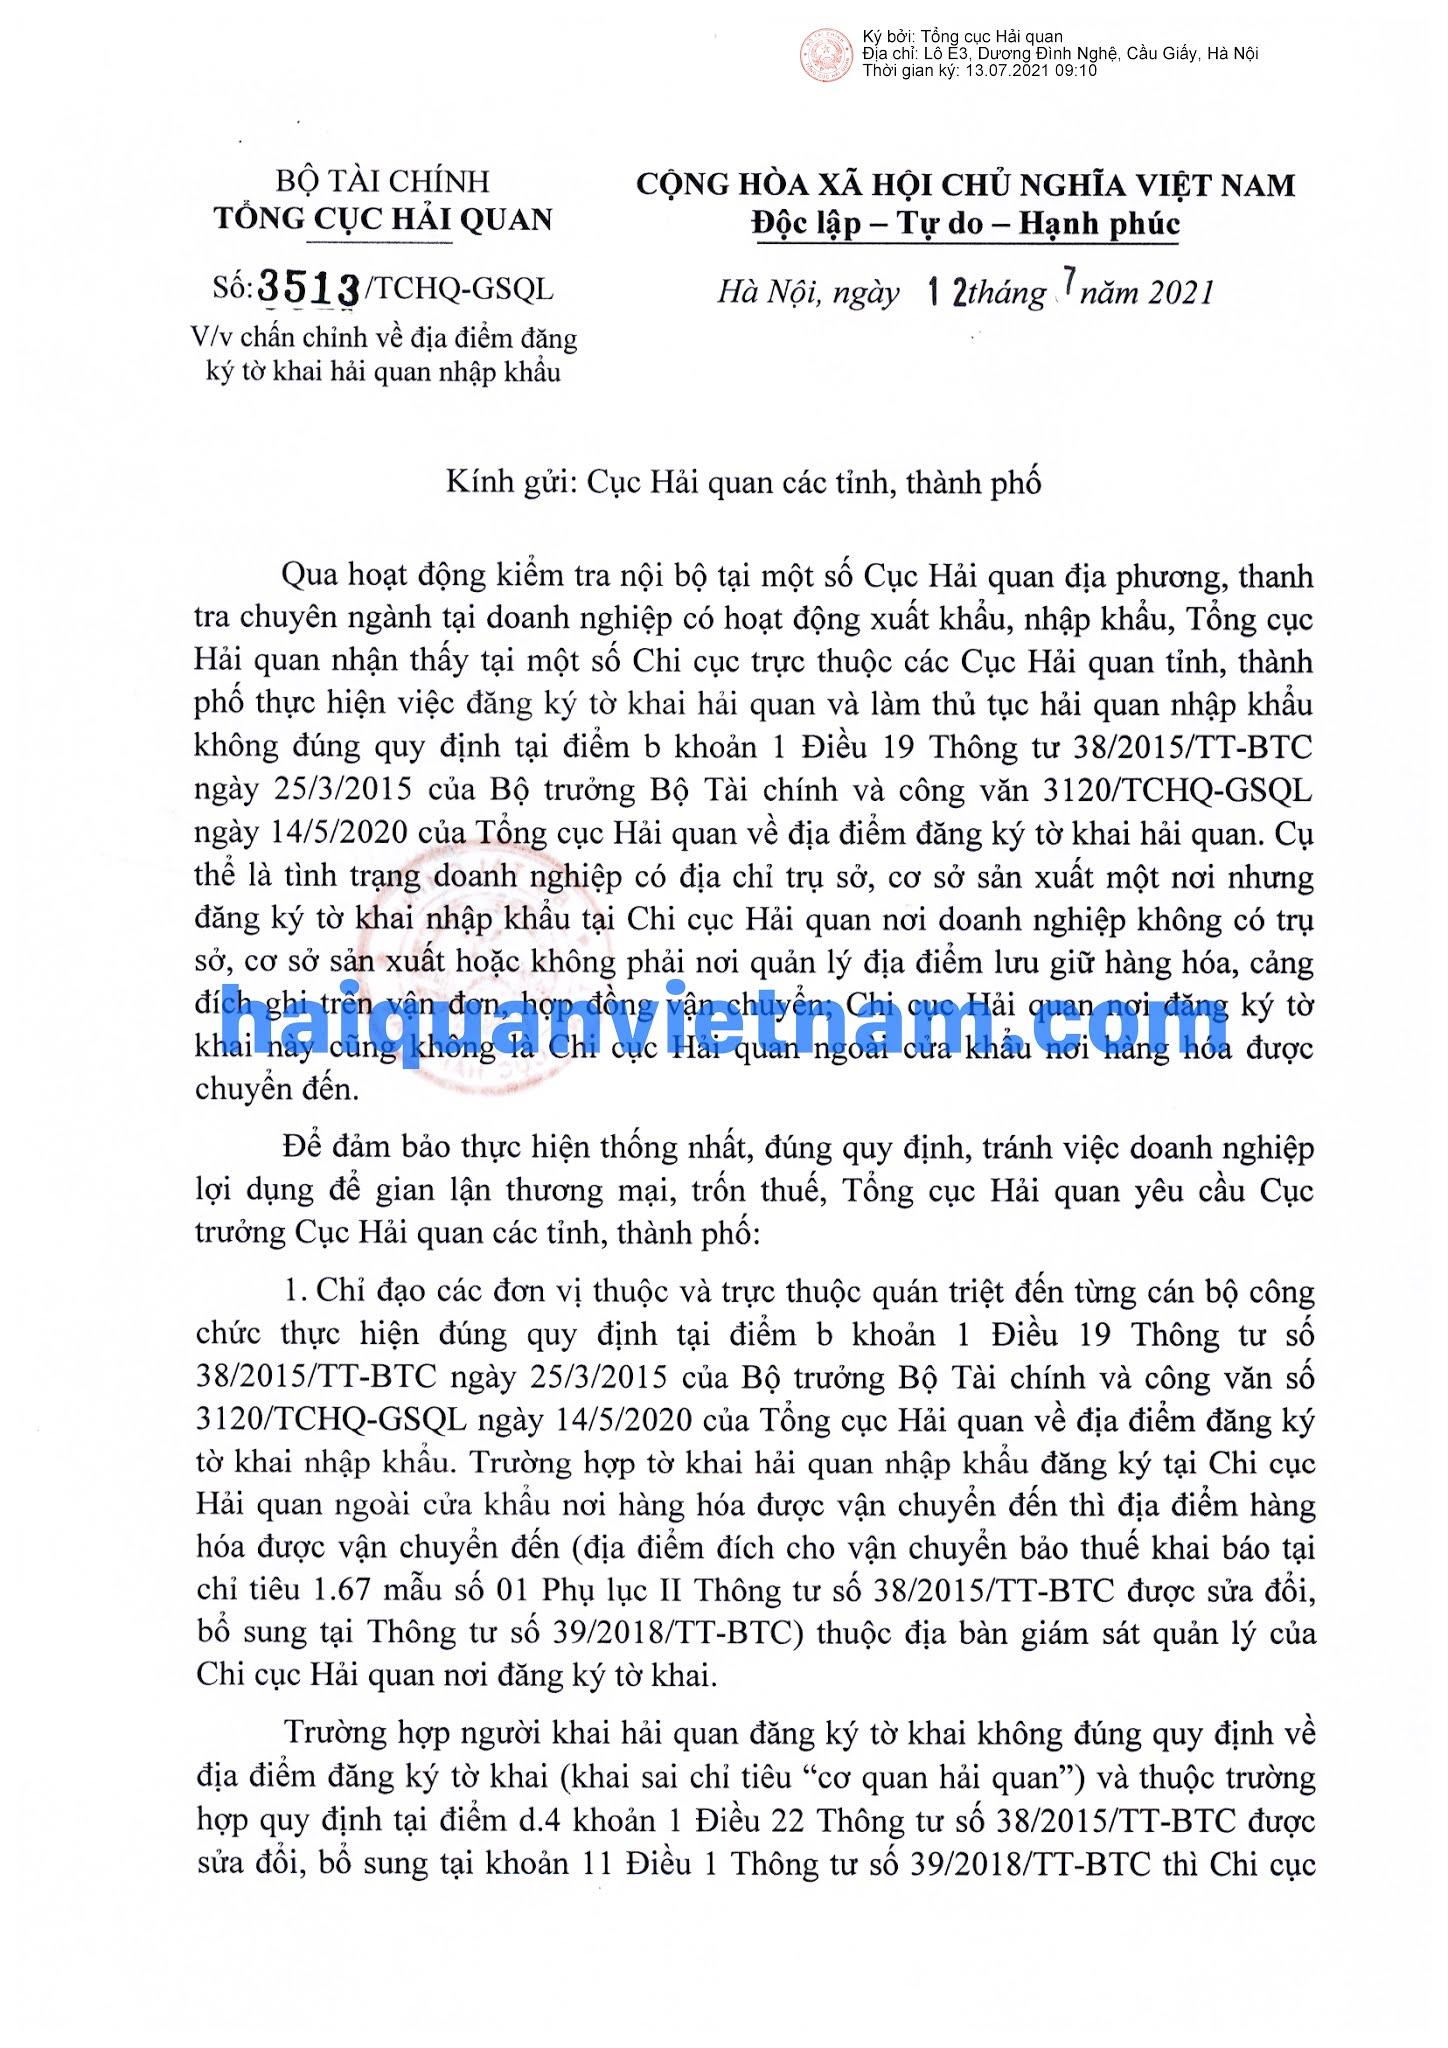 [Image: 210712-3513-TCHQ-GSQL_haiquanvietnam_01.jpg]